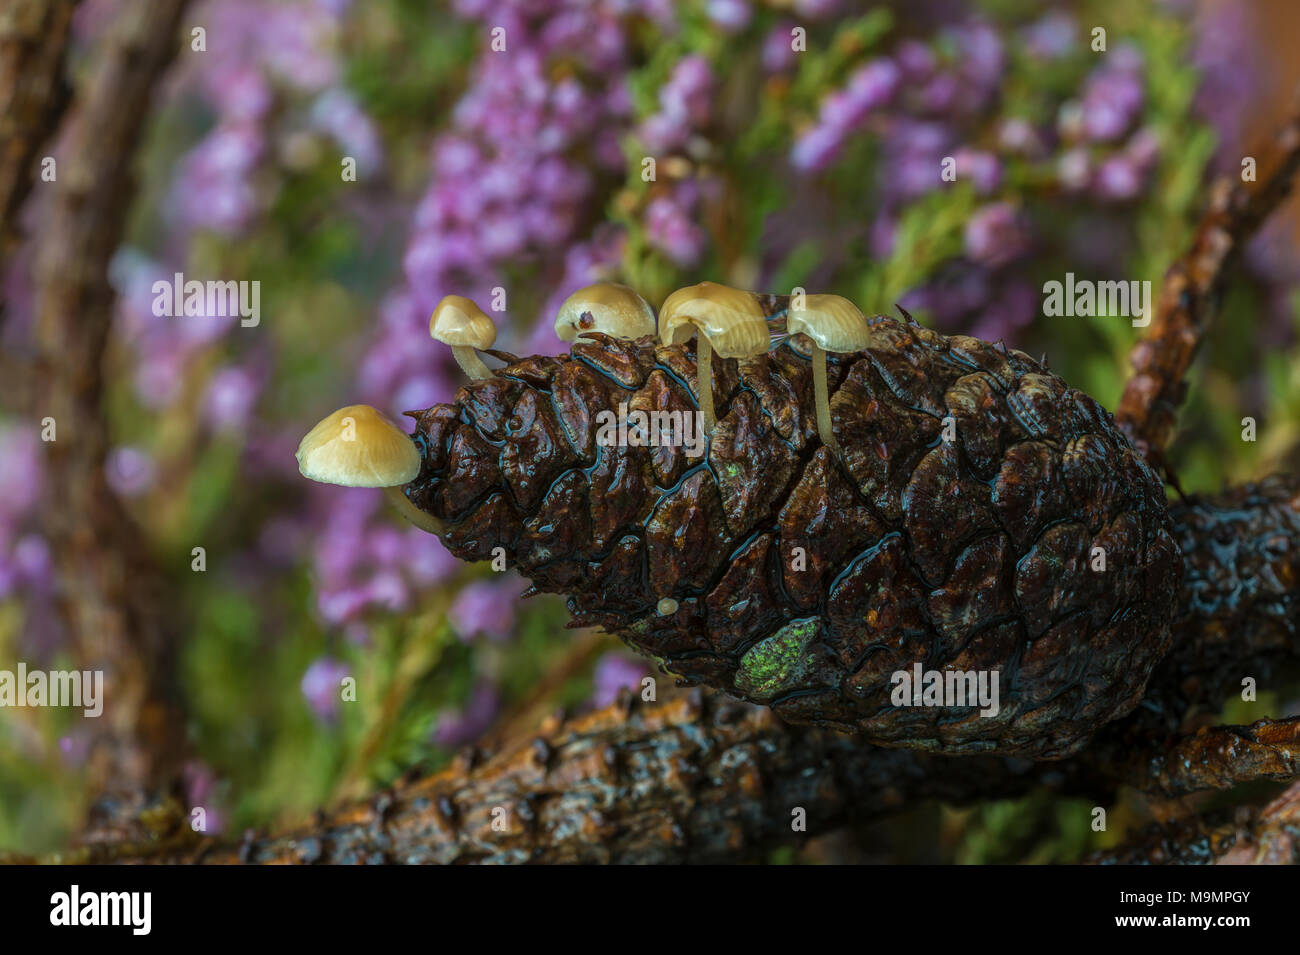 Conifer Cone Caps (Baeospora myosura), on pine cone, Syddanmark, Denmark - Stock Image